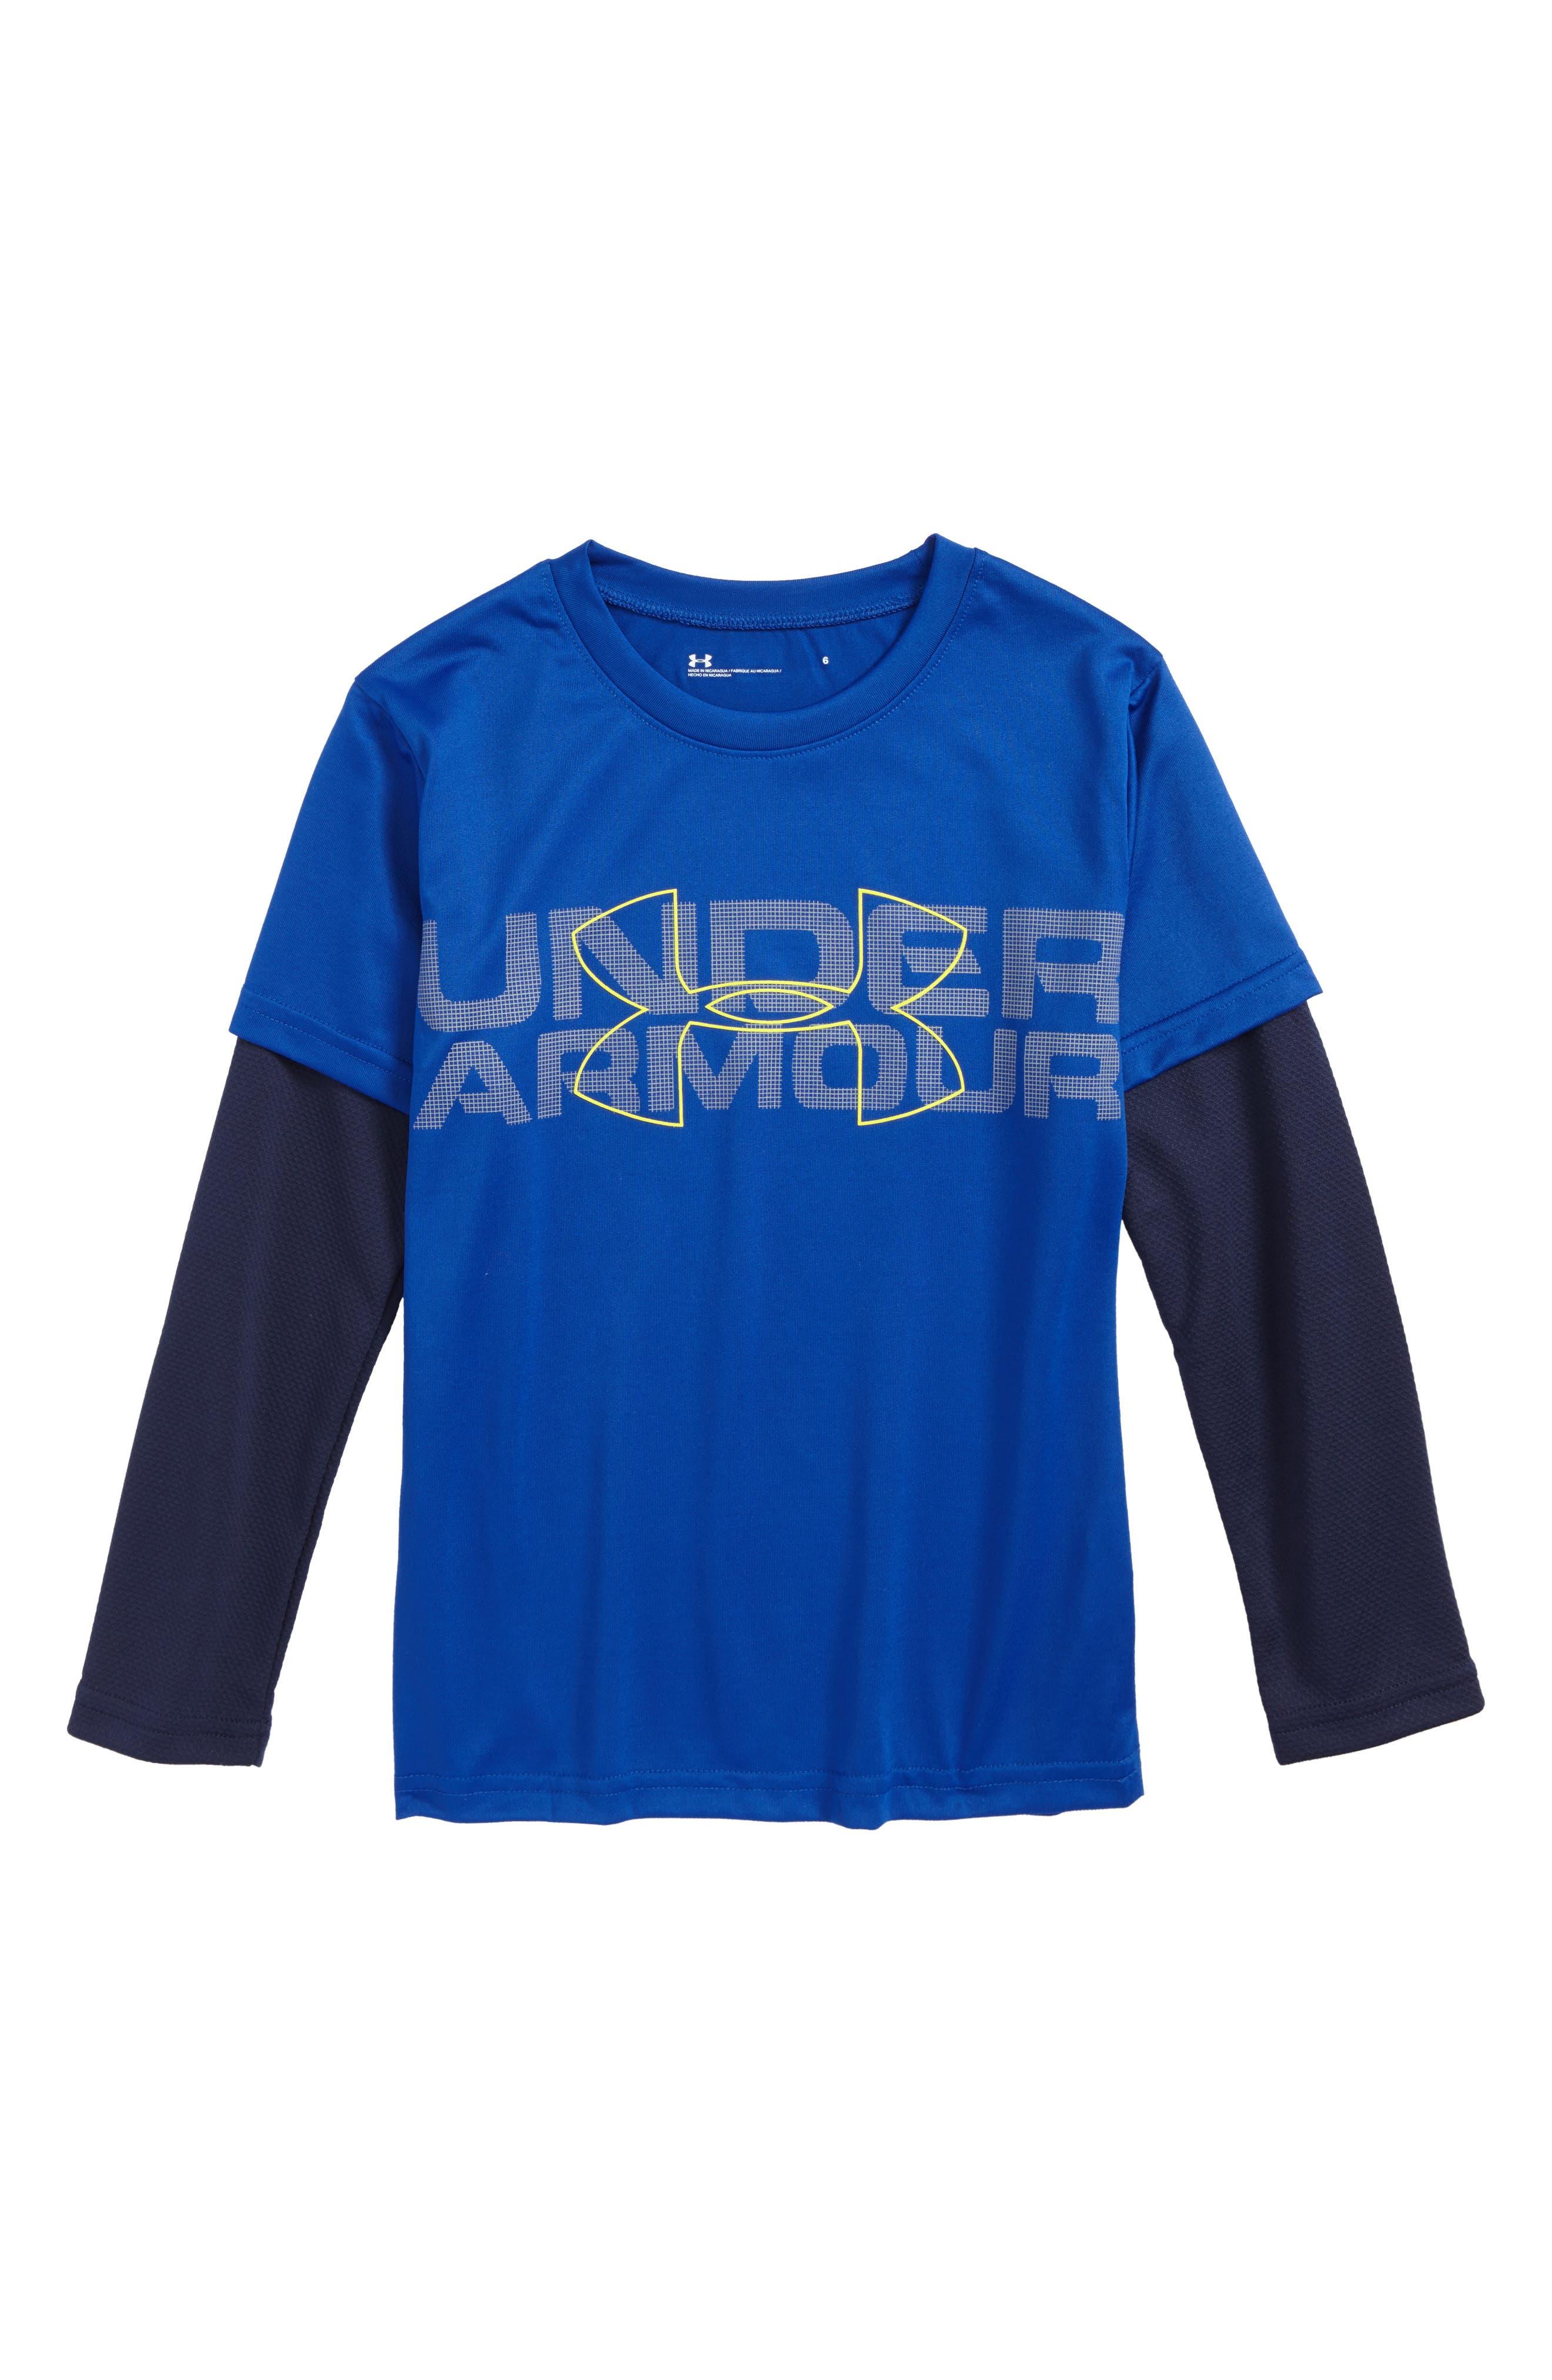 Main Image - Under Armour Wordmark Slider Layered T-Shirt (Toddler Boys & Little Boys)